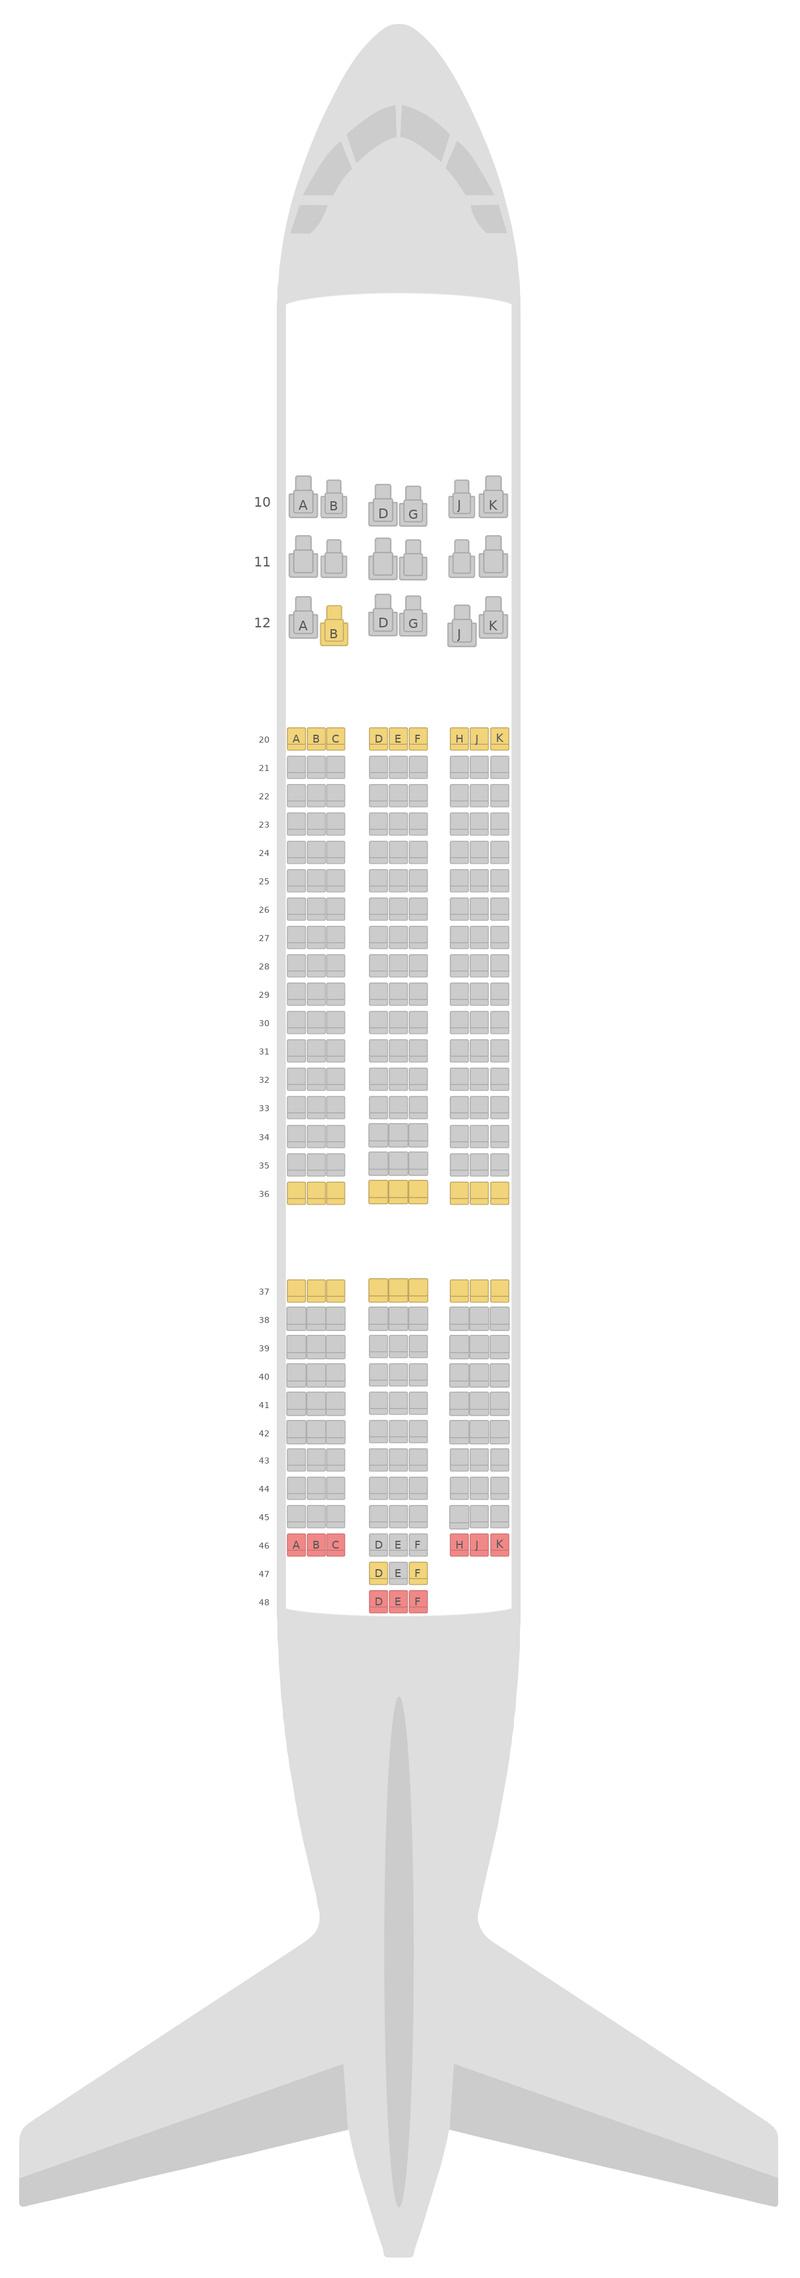 Seat Map Oman Air Boeing 787-8 (788)